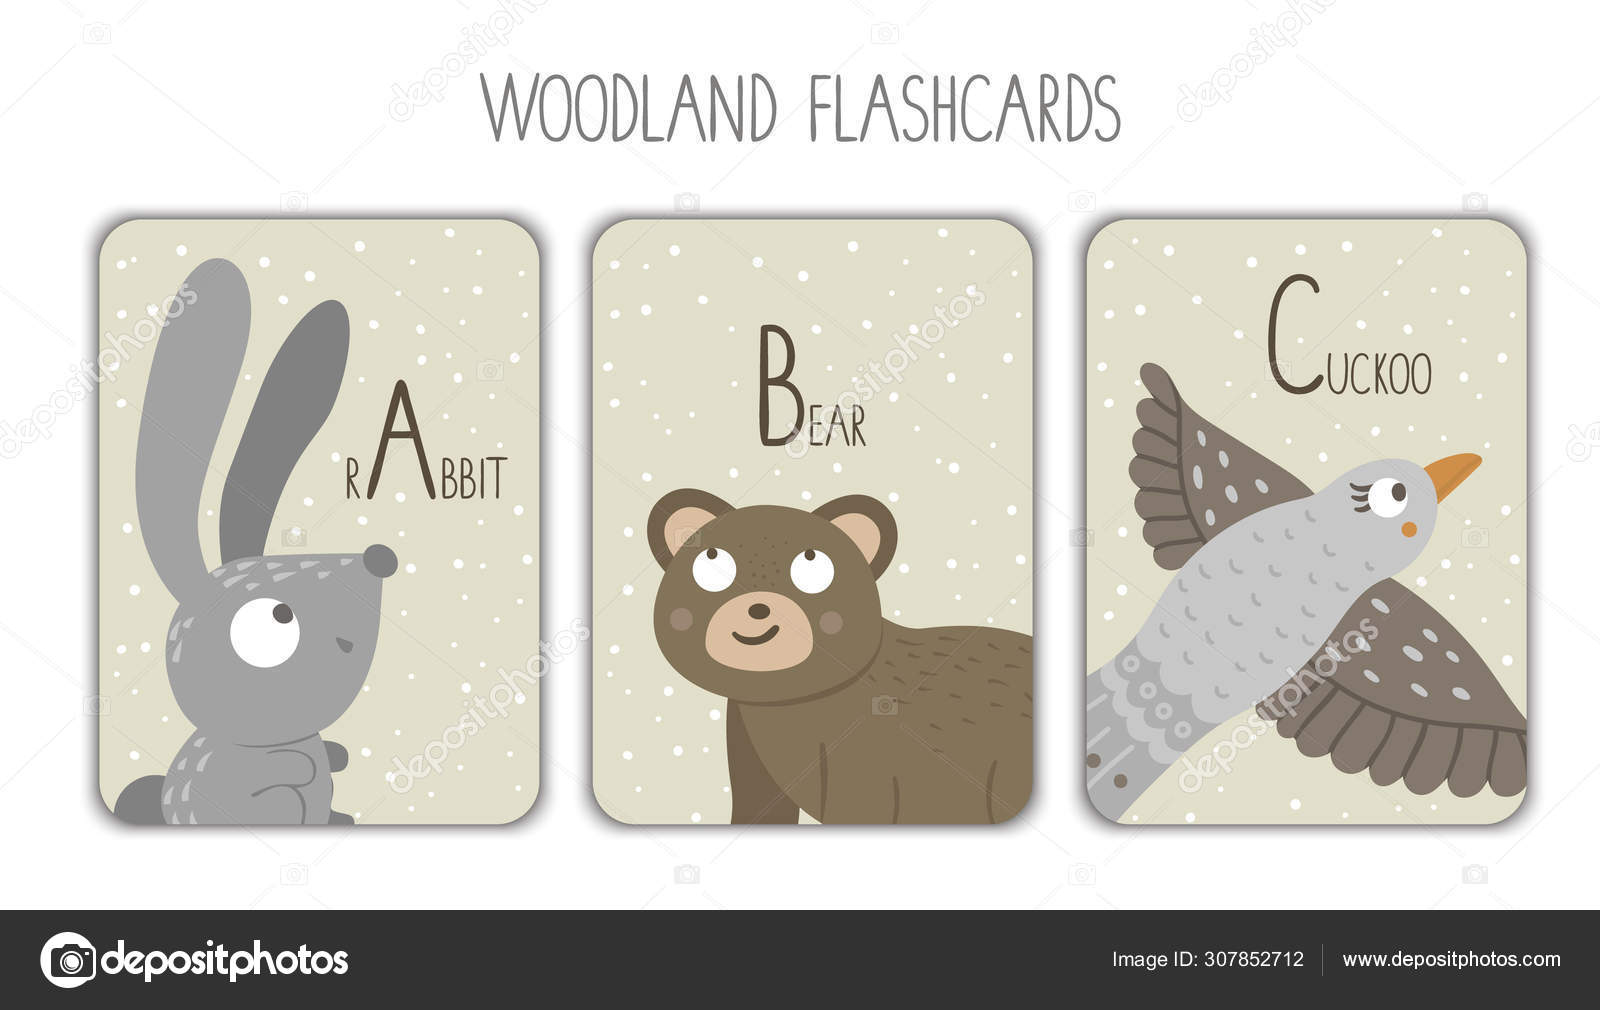 Colorful alphabet letters A, B, C  Phonics flashcard  Cute